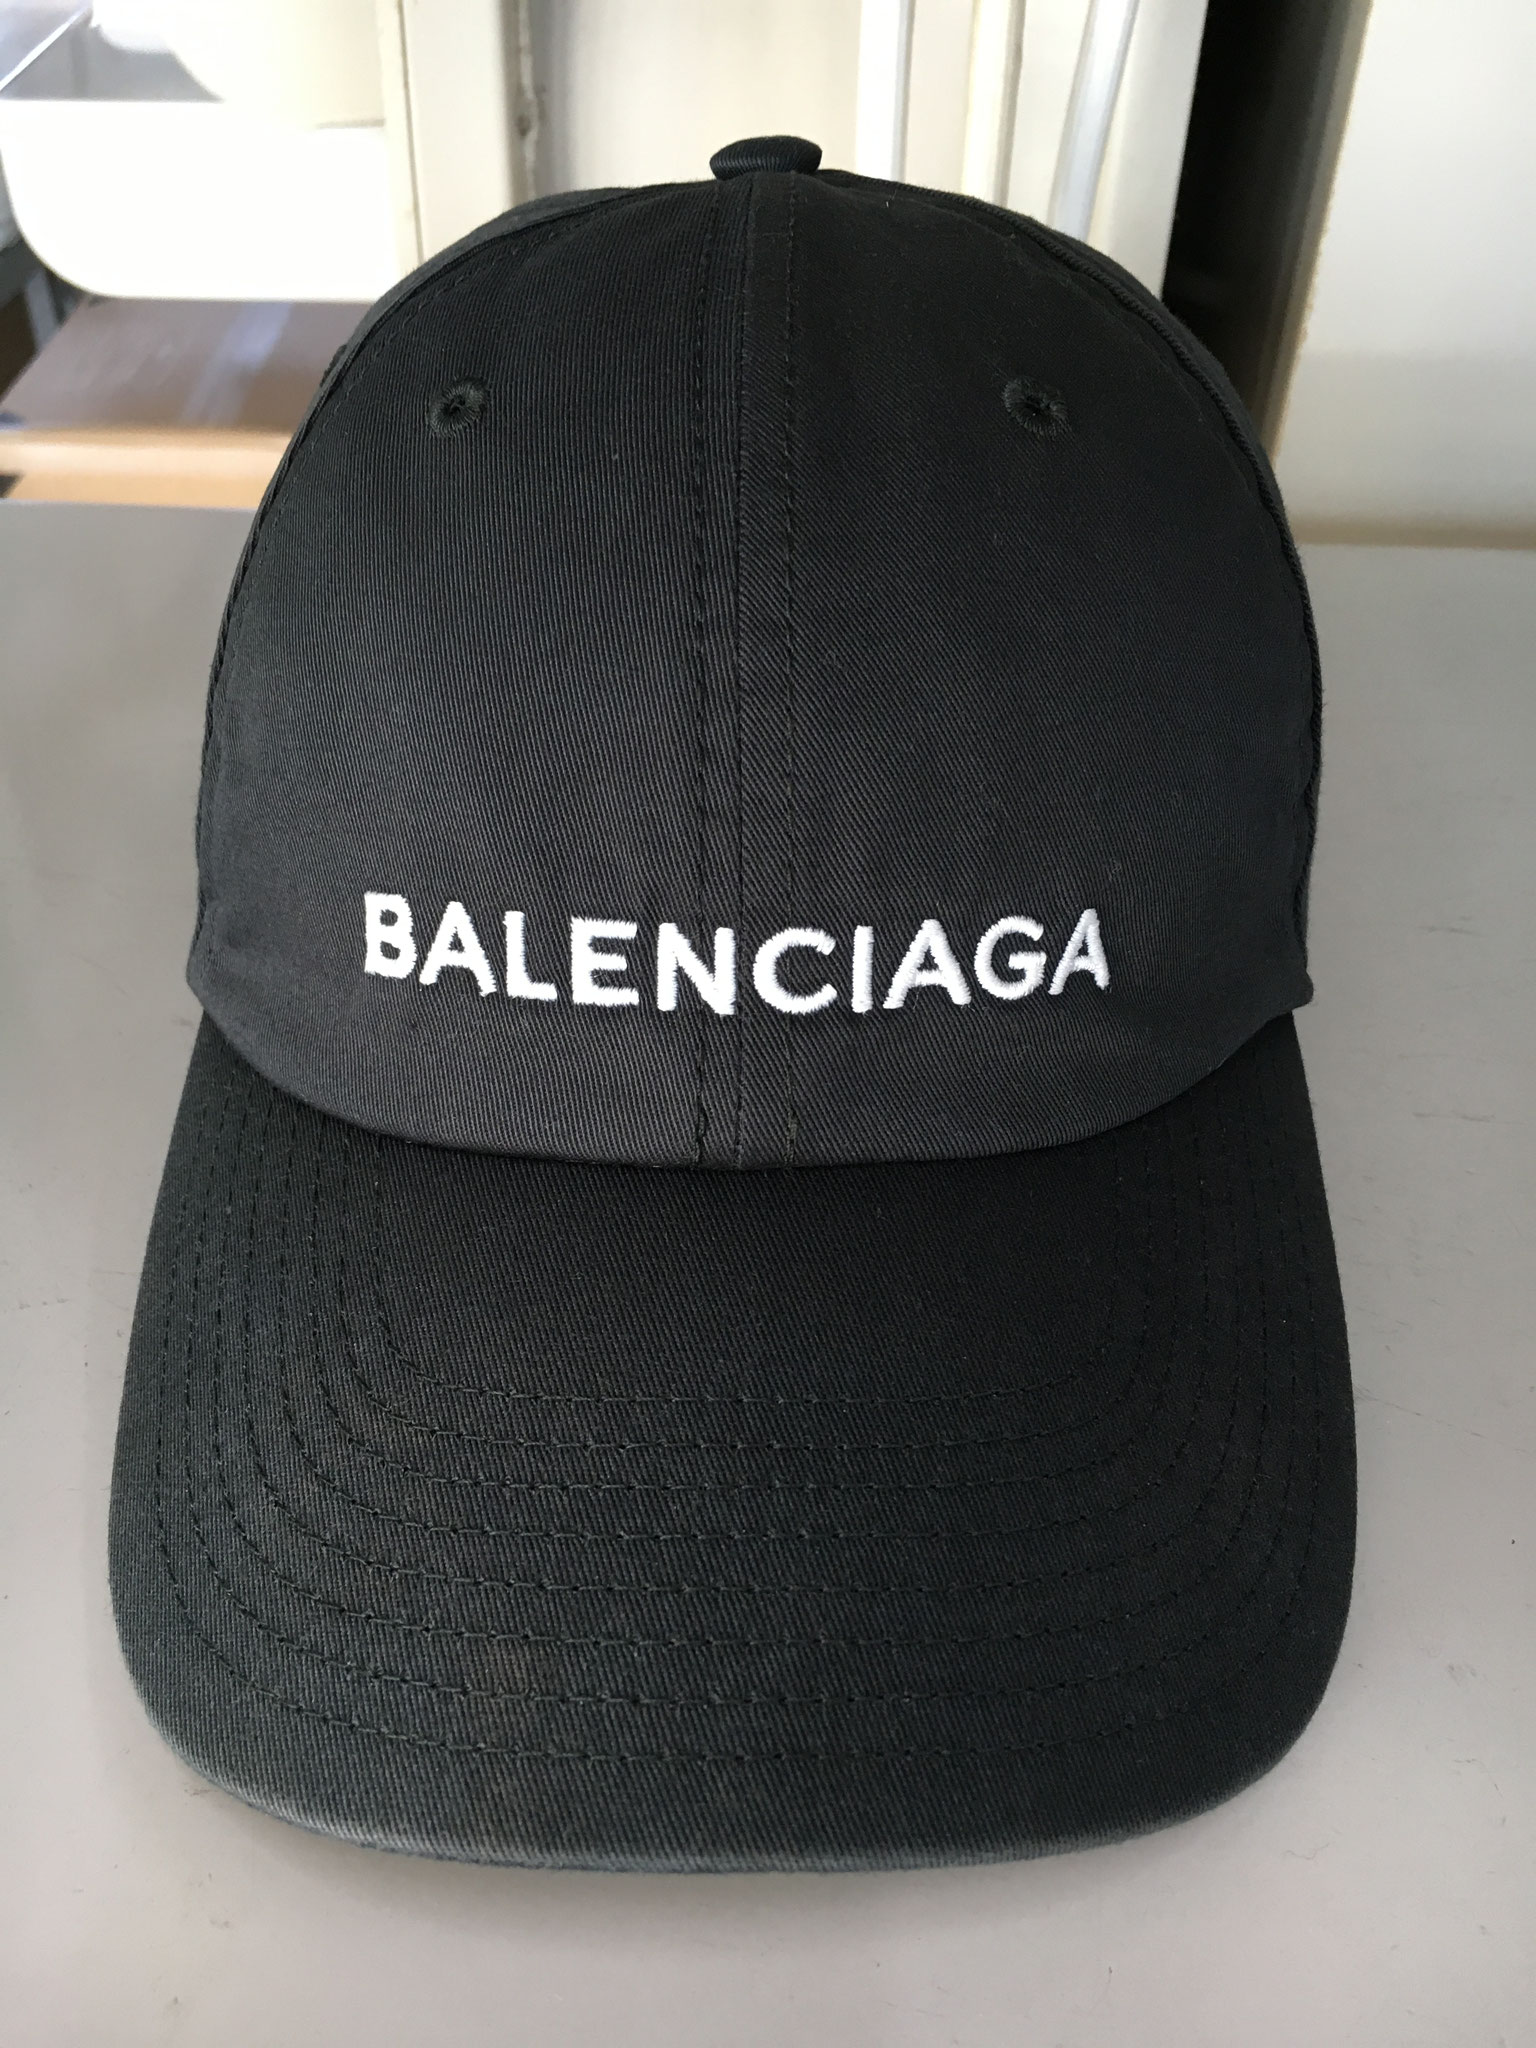 BALENCIAGAの黒はダメージ回復困難